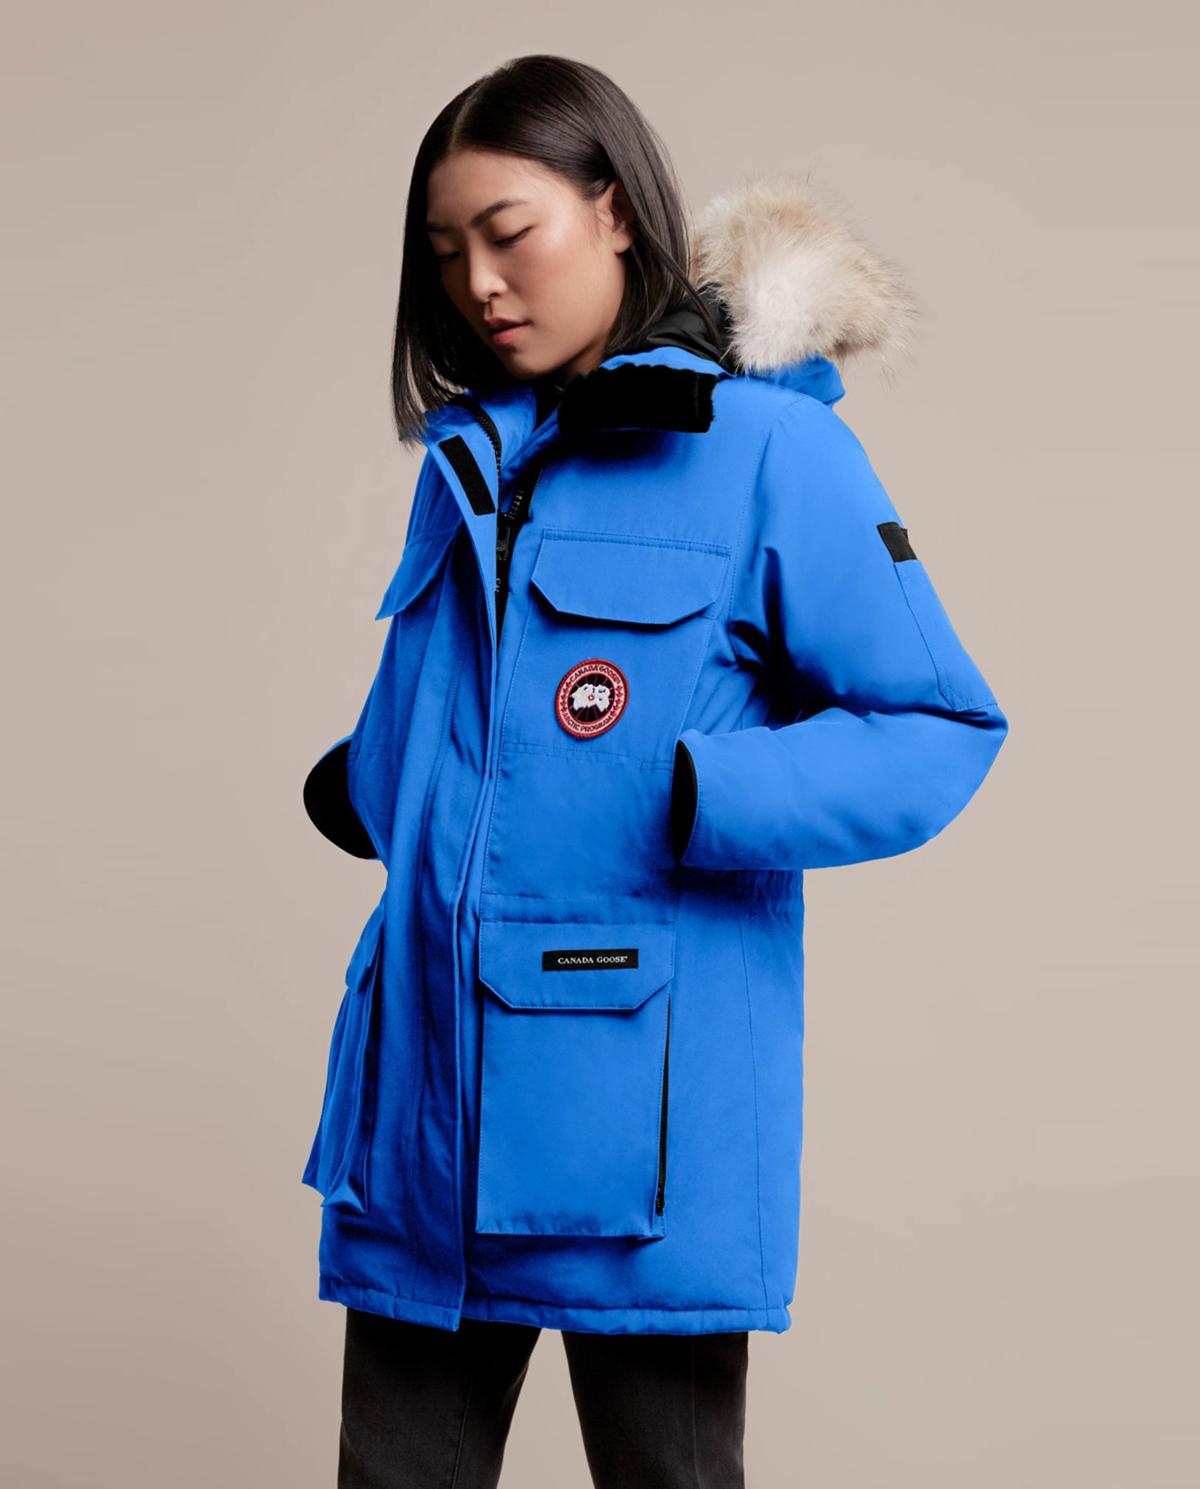 kurtka parka niebieska canada goose